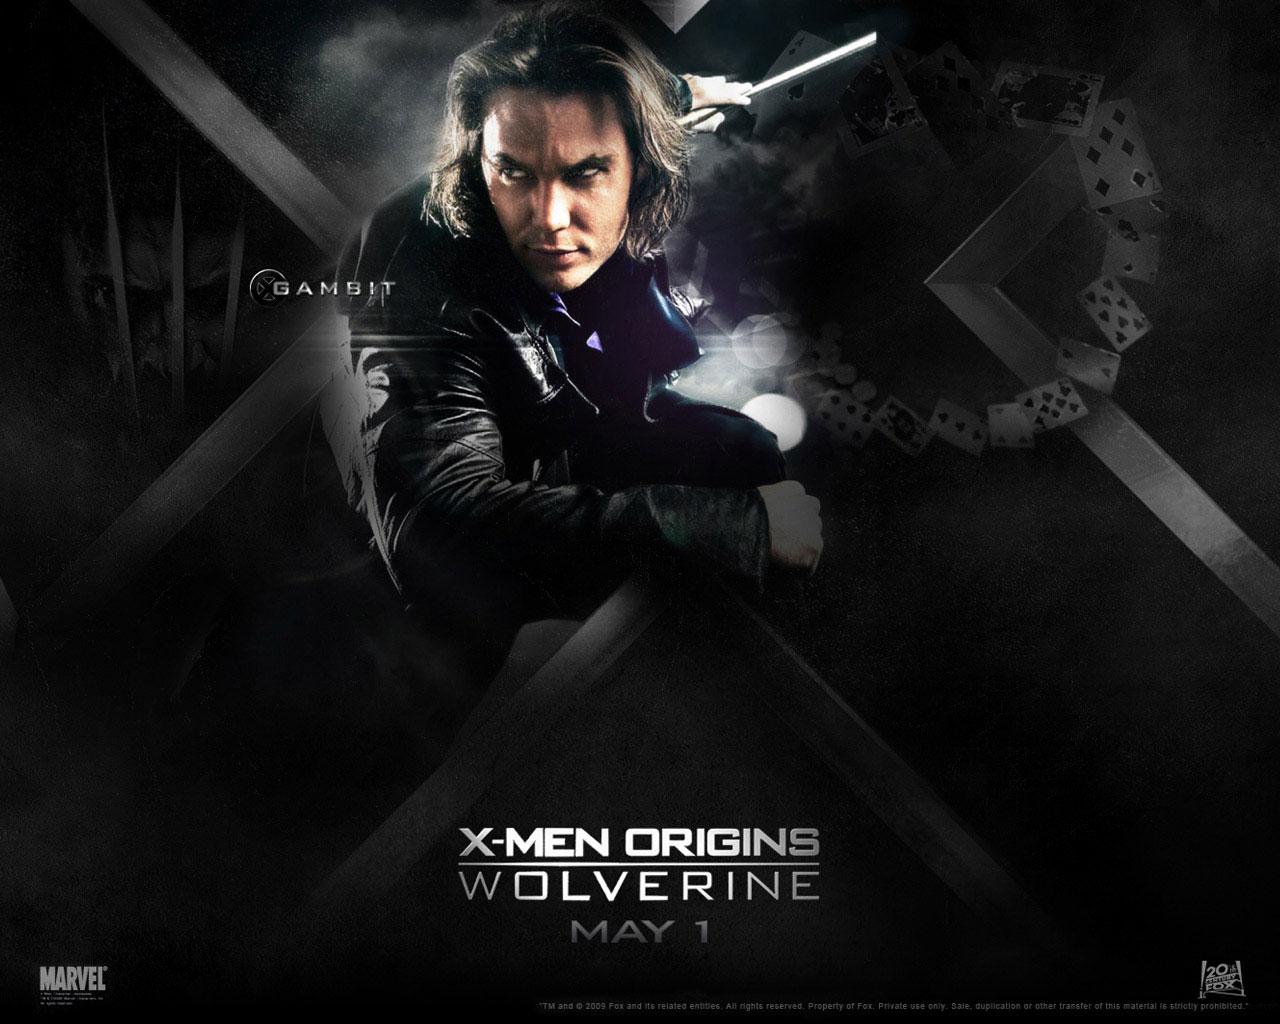 1280x1024 X Men Origins Wolverine Movie Wallpapers JoBlocom 1280x1024